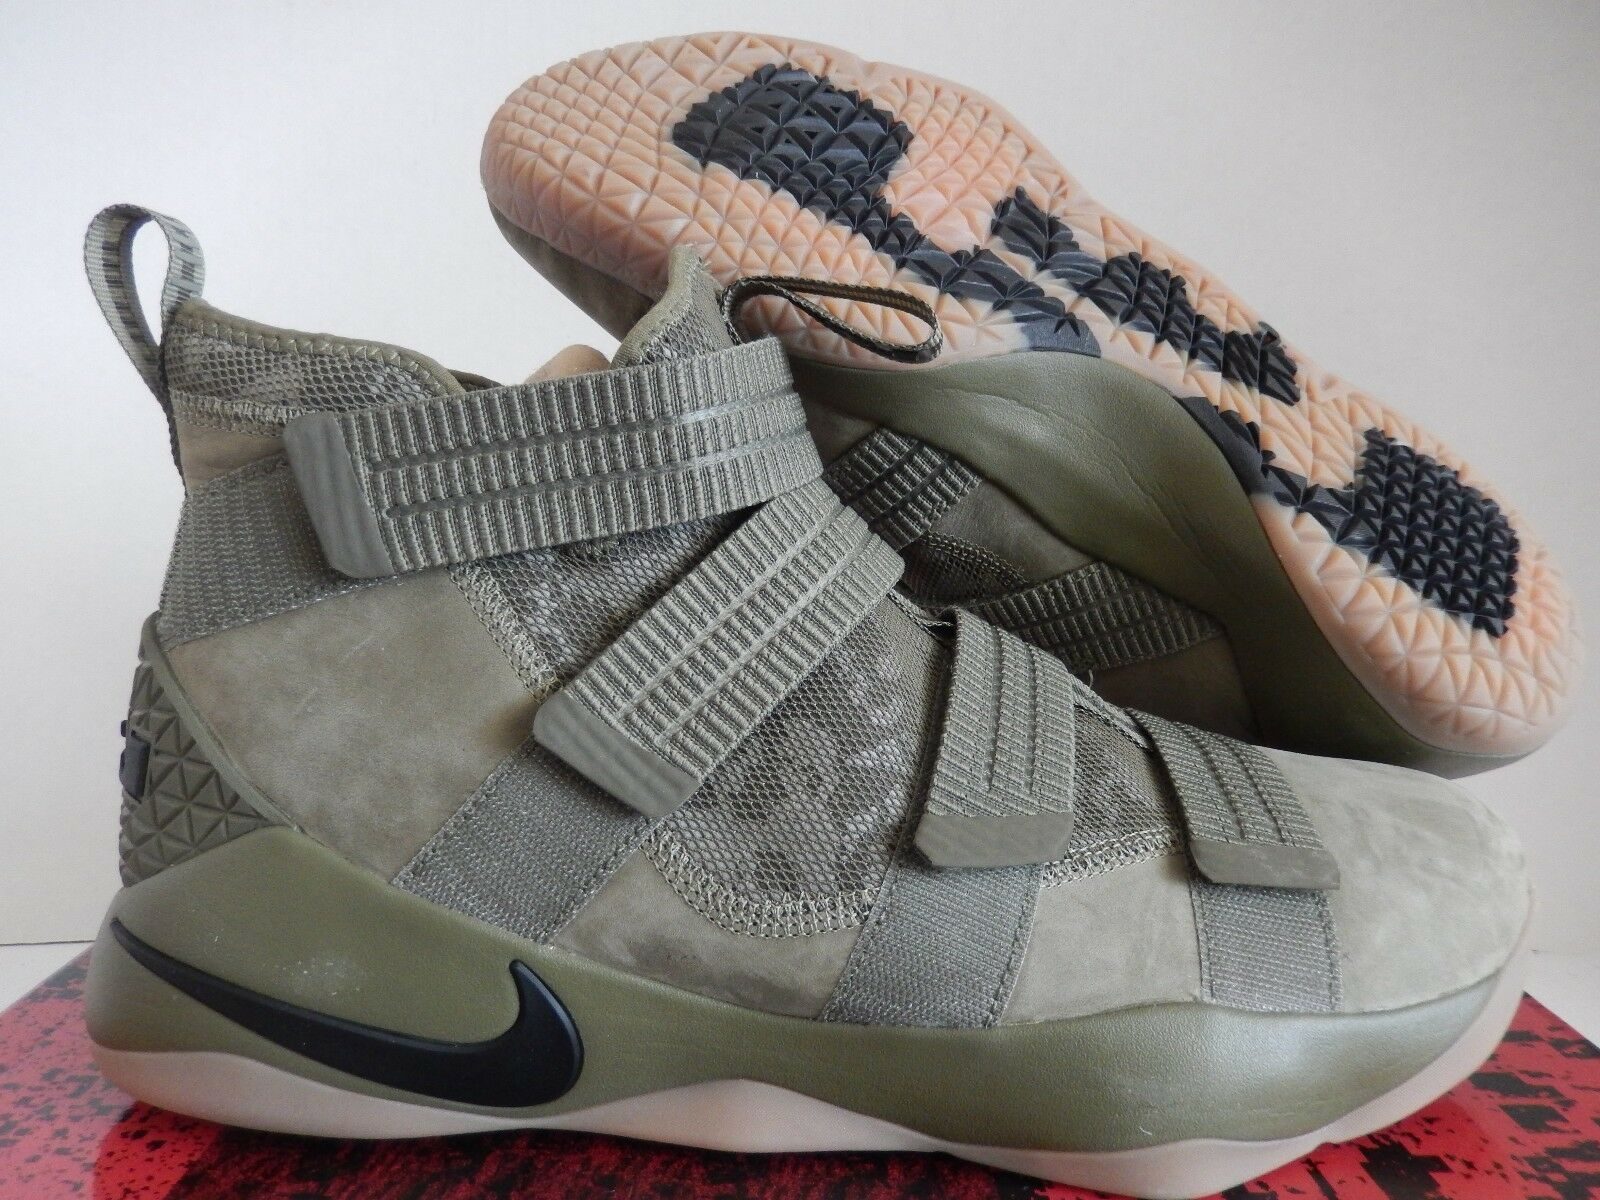 Nike Nike Nike lebron soldato xi sfg medio olive green-nero-nero sz 14 [897646-200] ecd95d